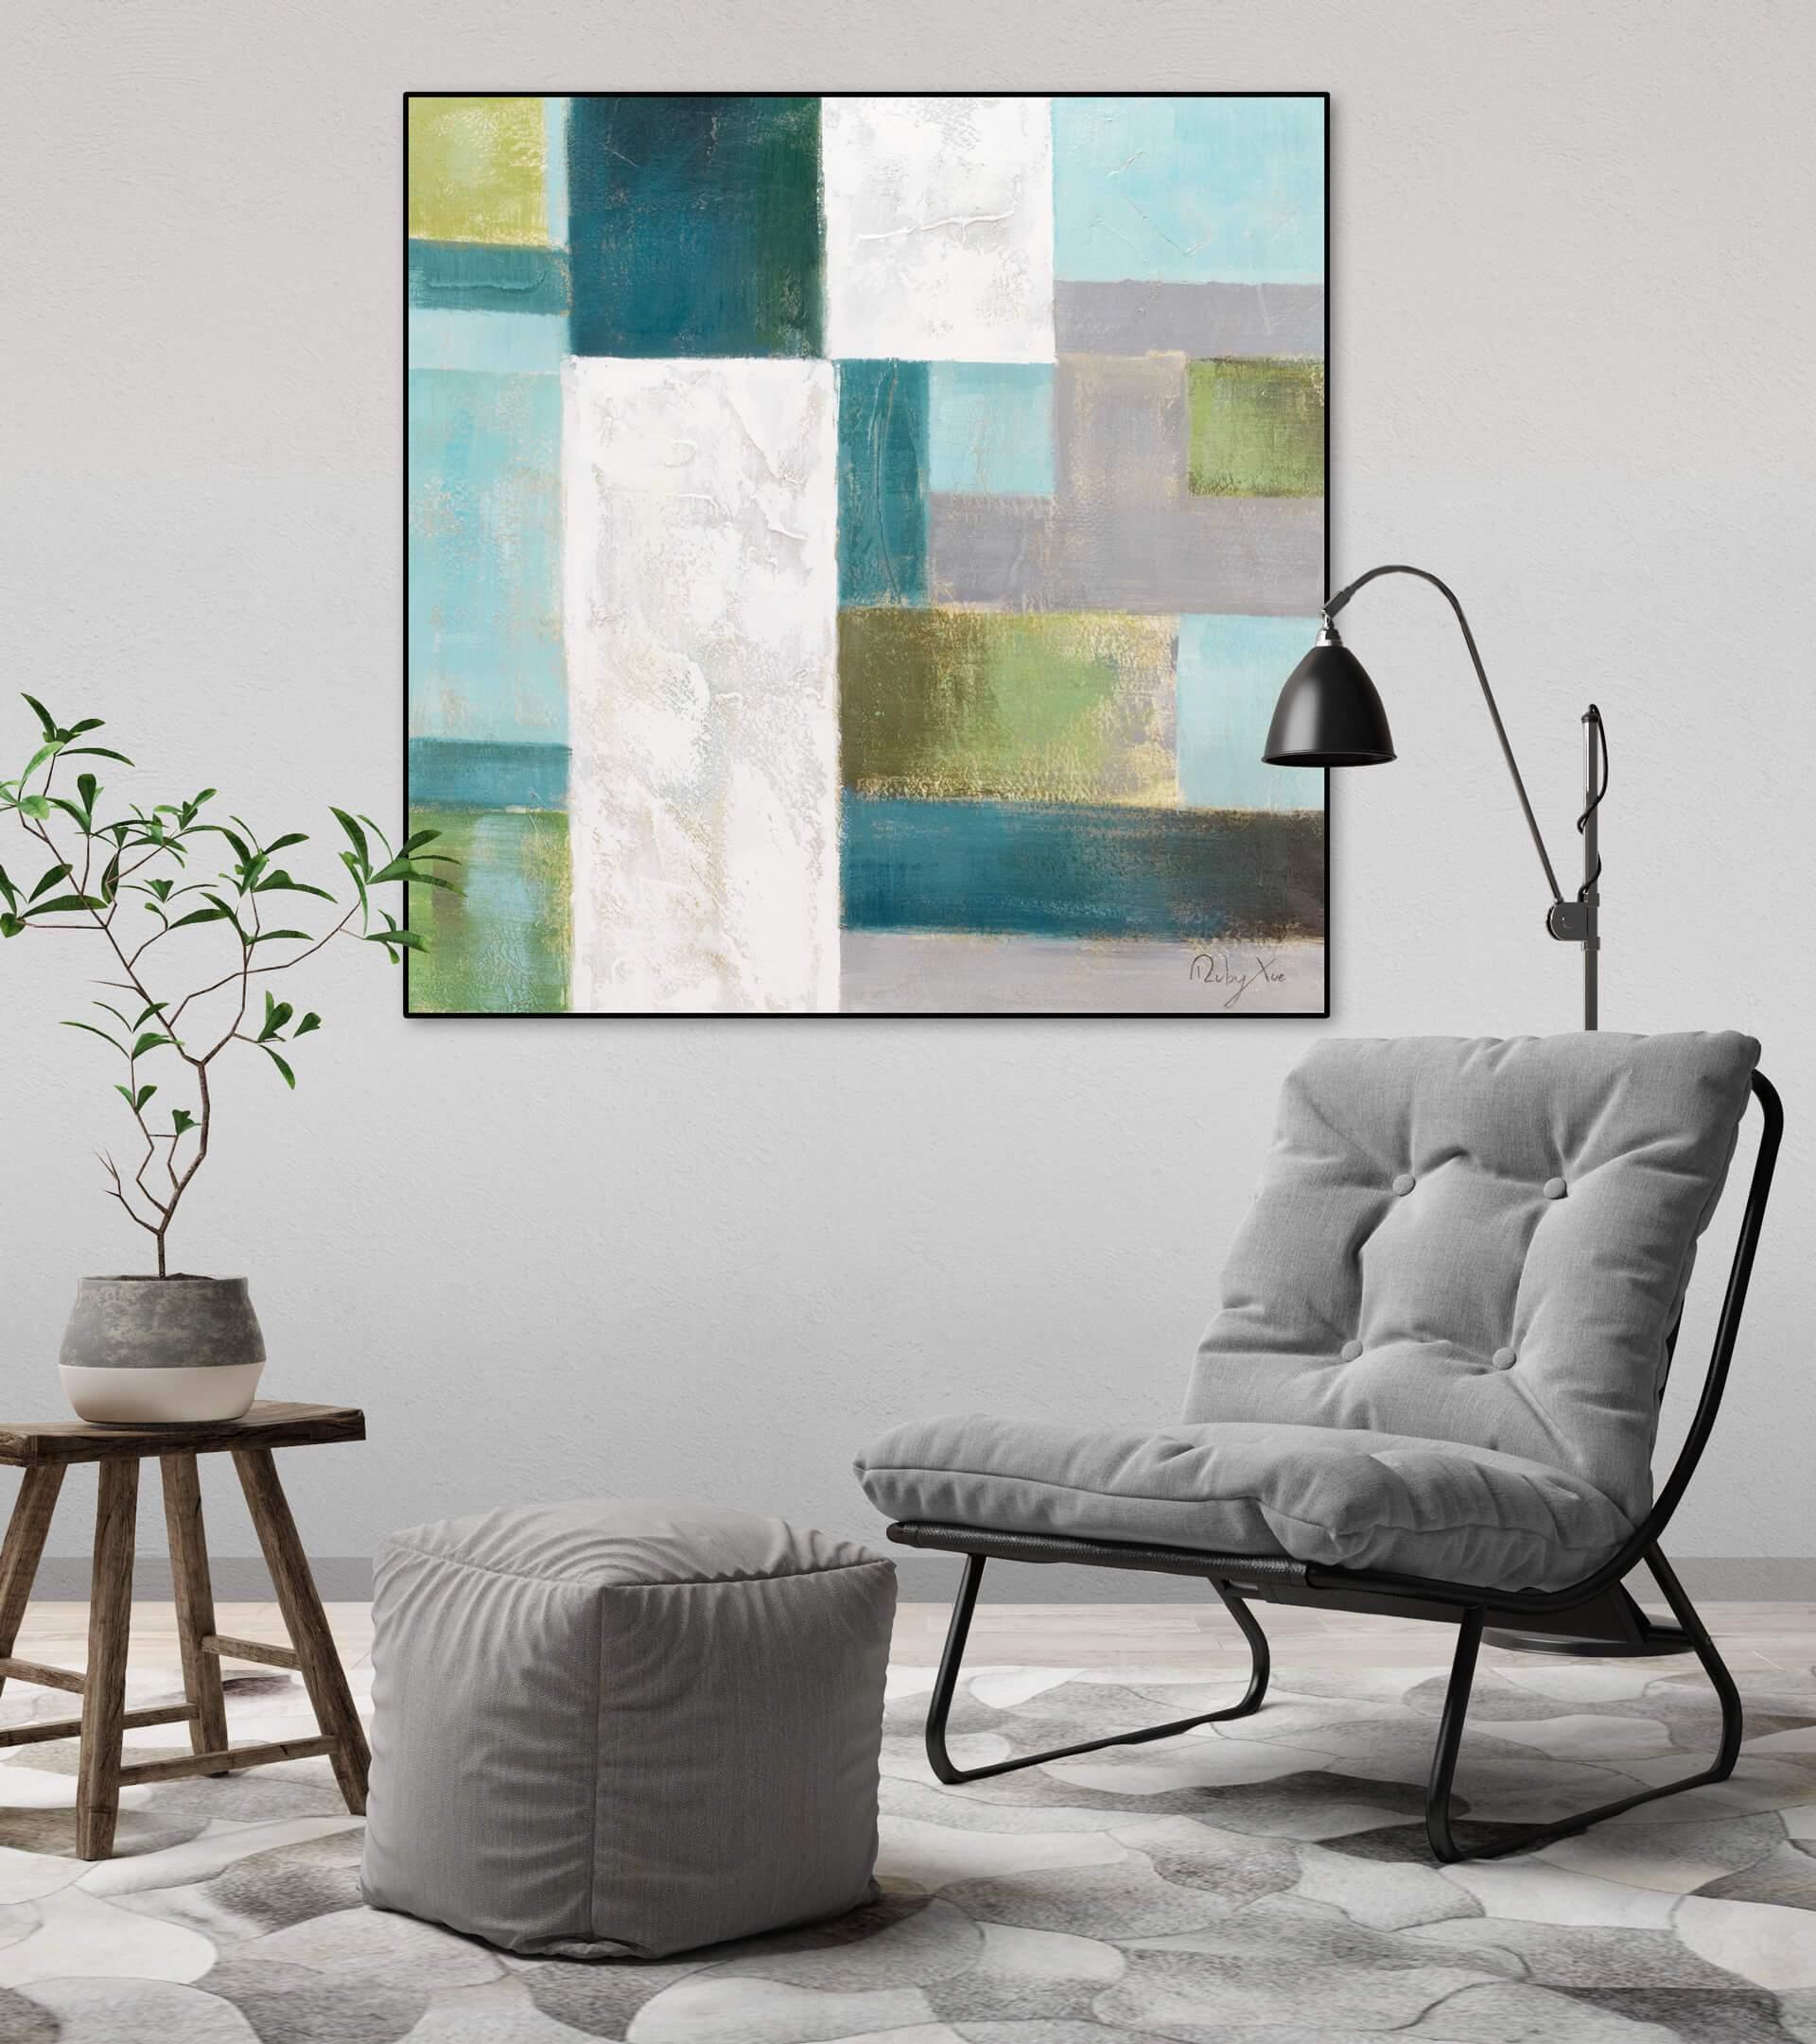 KL modern quadrate modern acryl gemaelde oel bild oelgemaelde 04